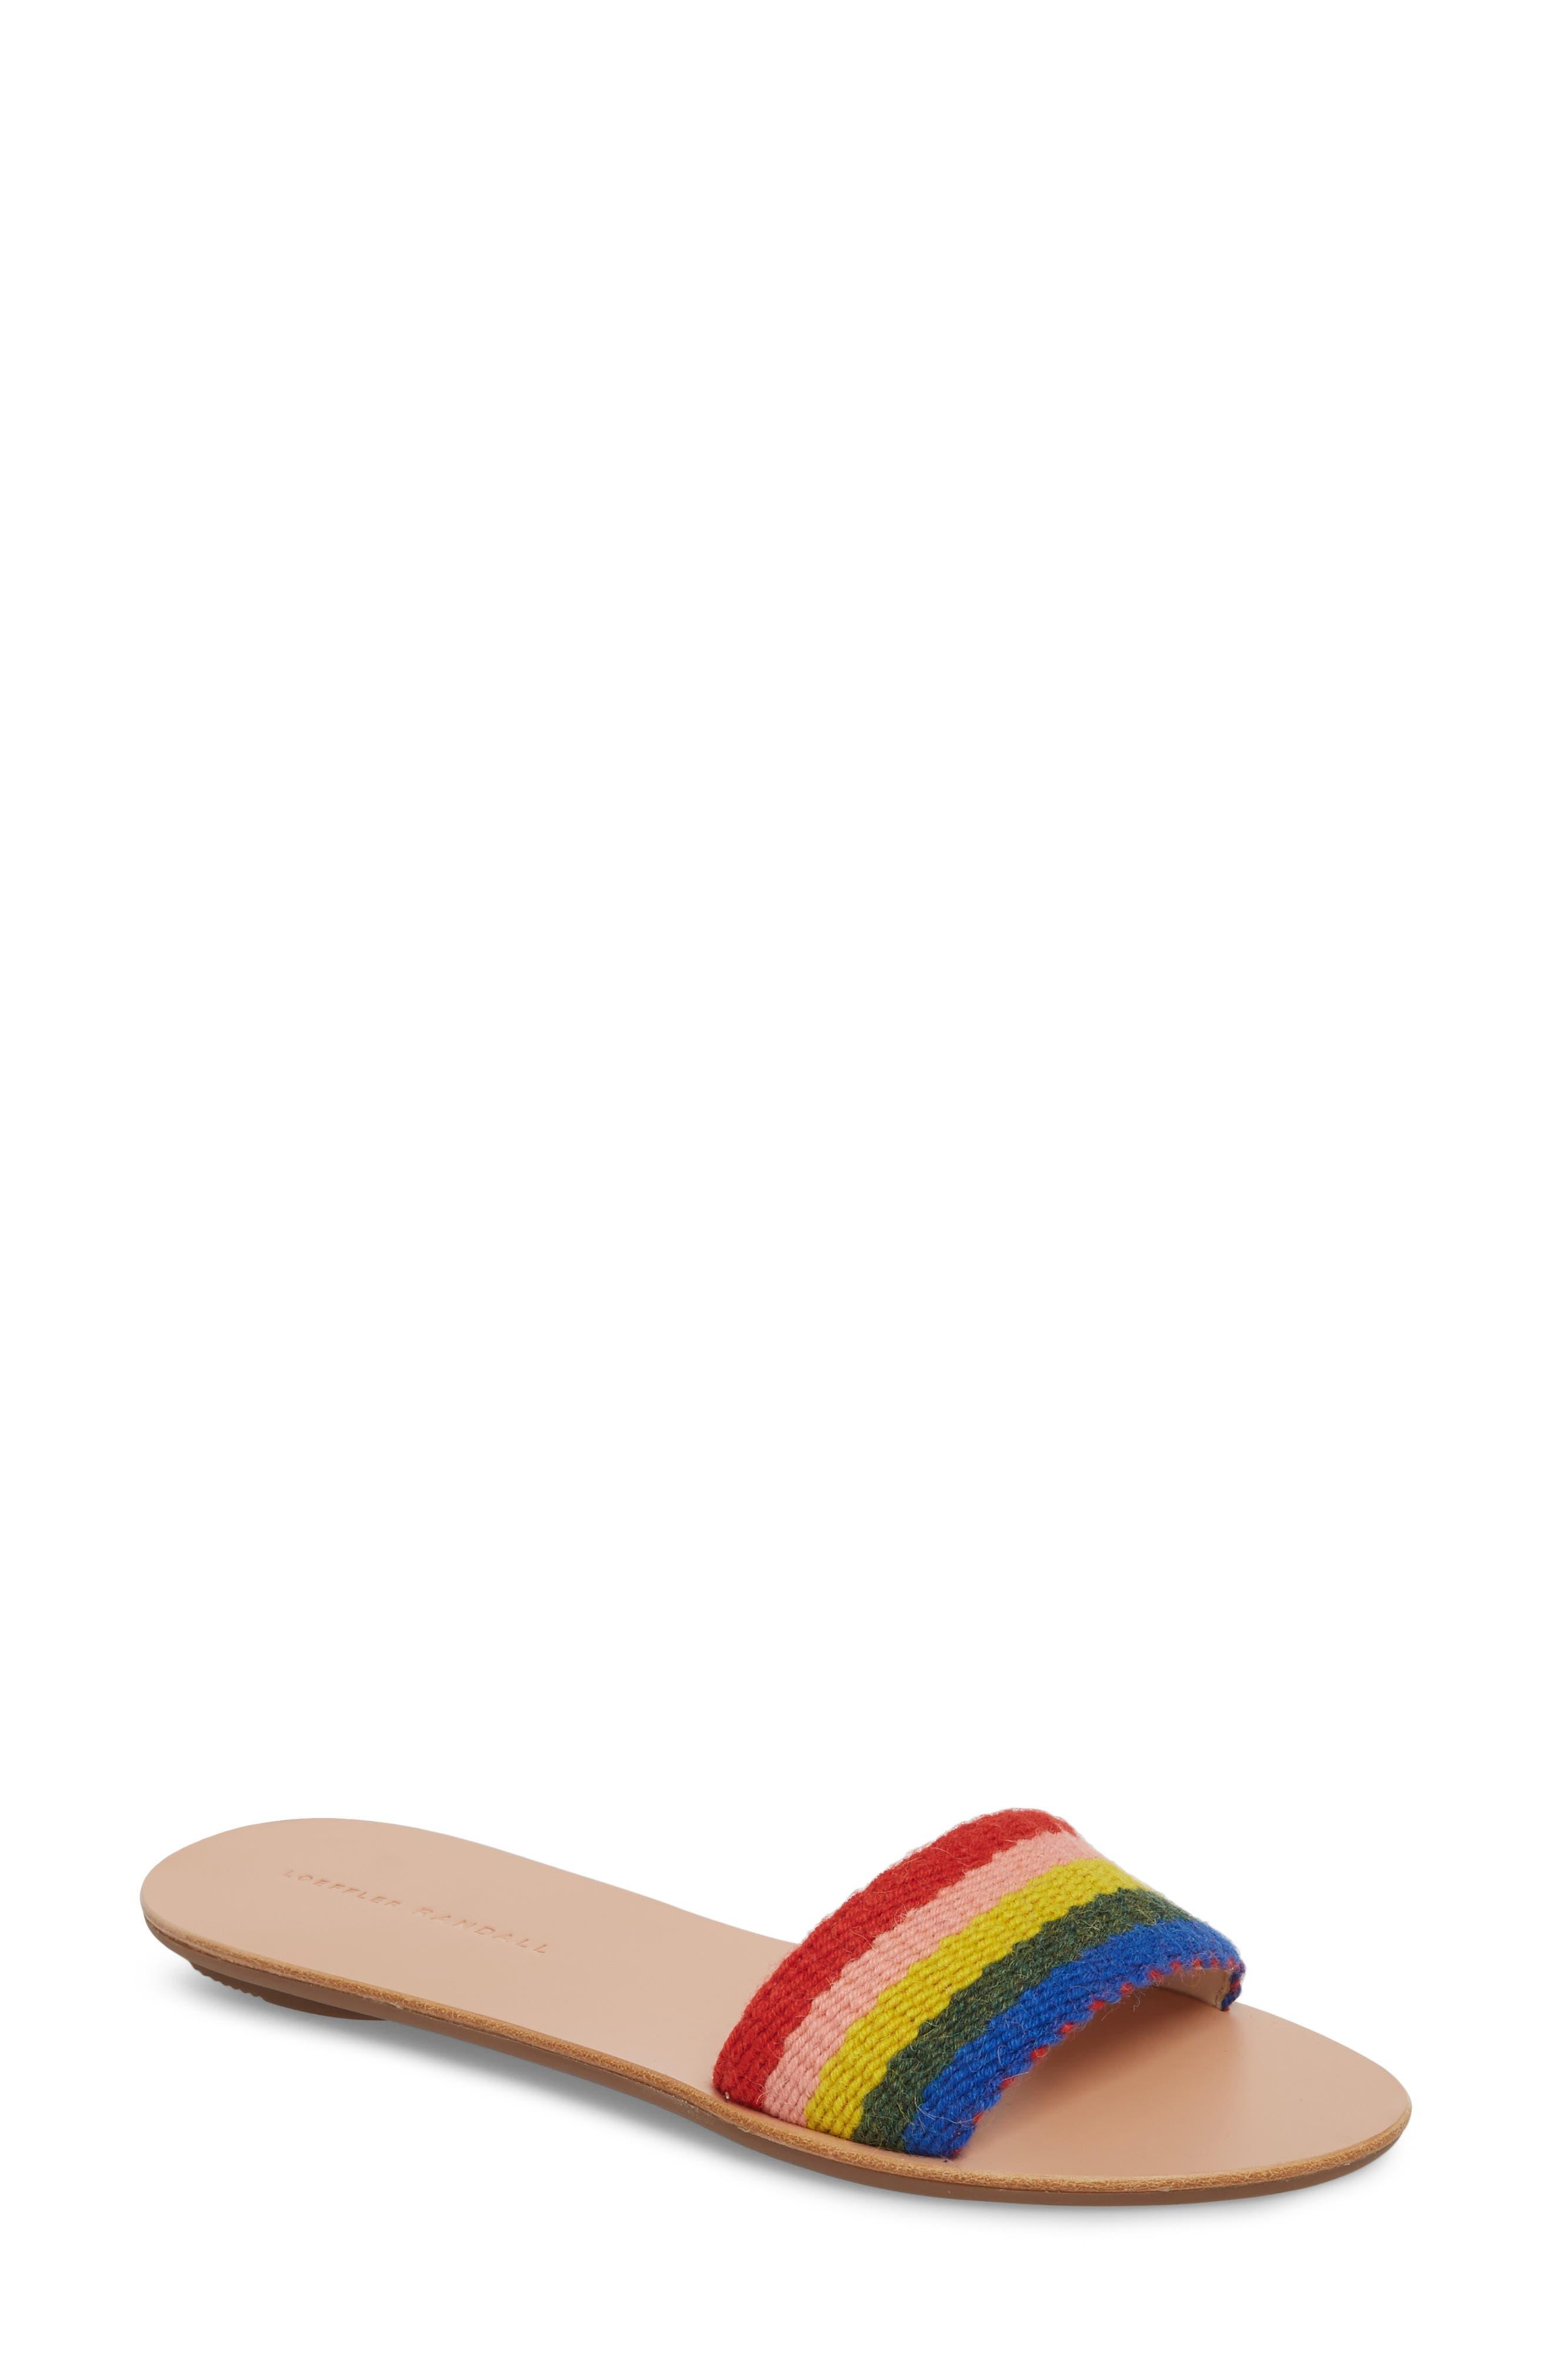 Loeffler Randall Women's Stella Alpaca Rainbow Slide Sandals UW6wB7JMv